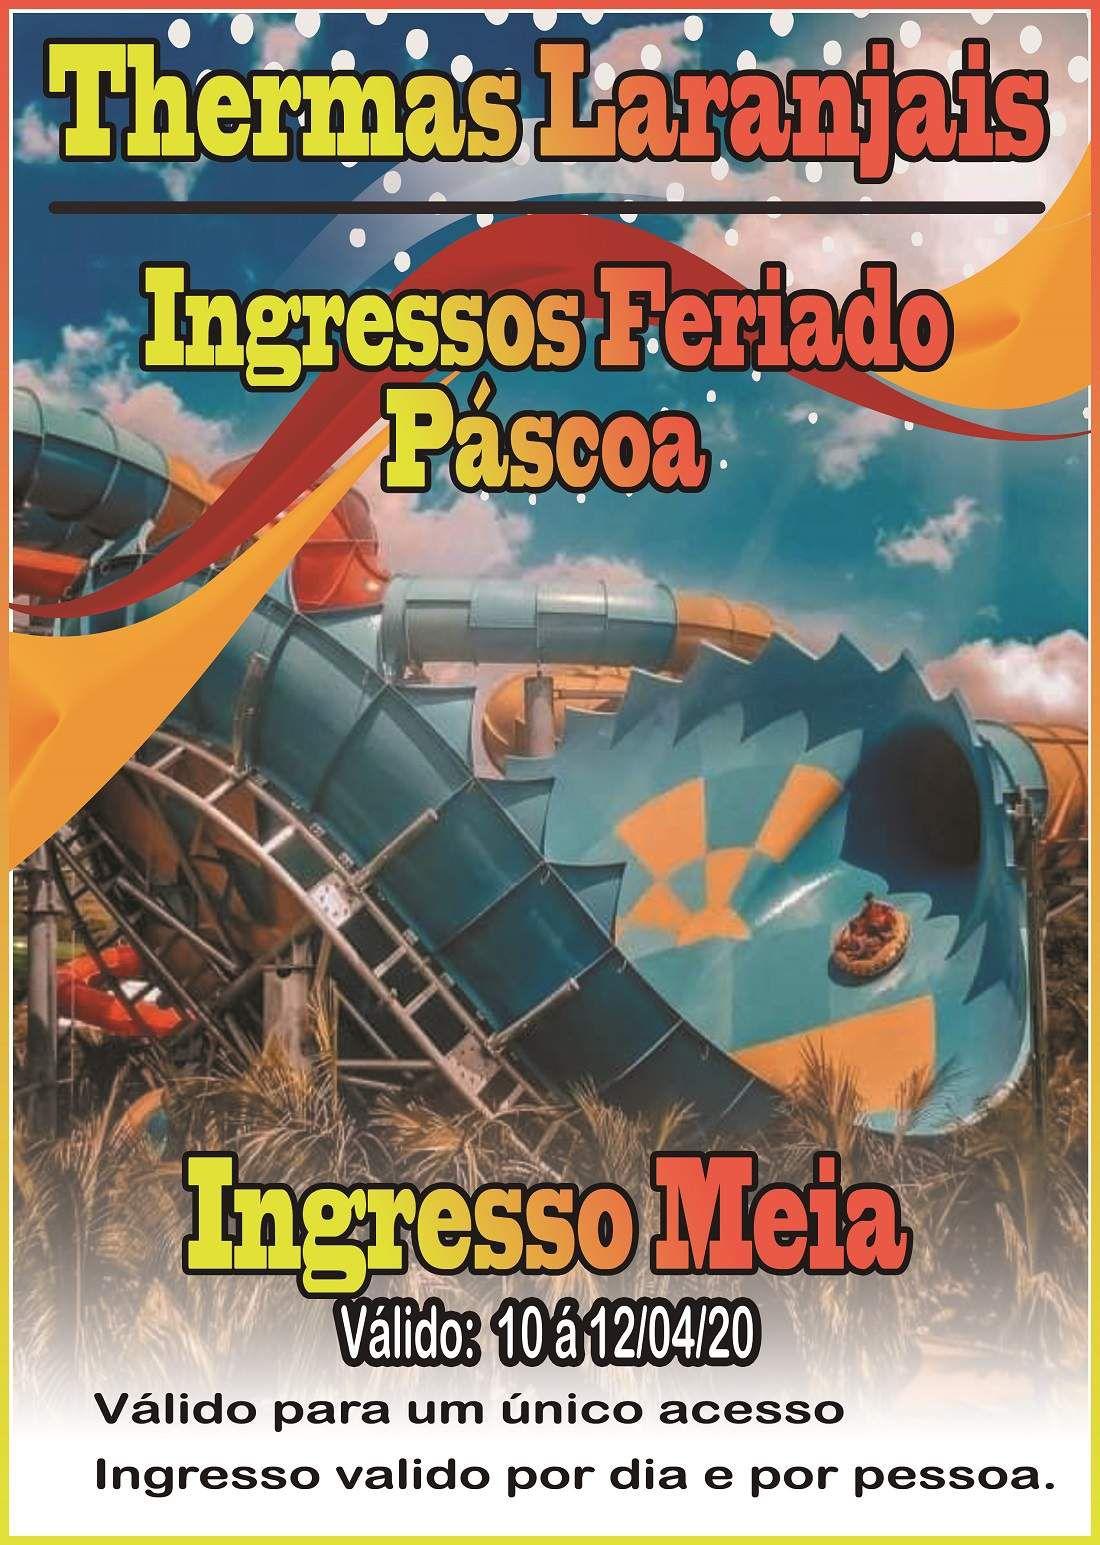 Ingresso Meia - Pascoa - Thermas dos Laranjais  - Thermas Fácil